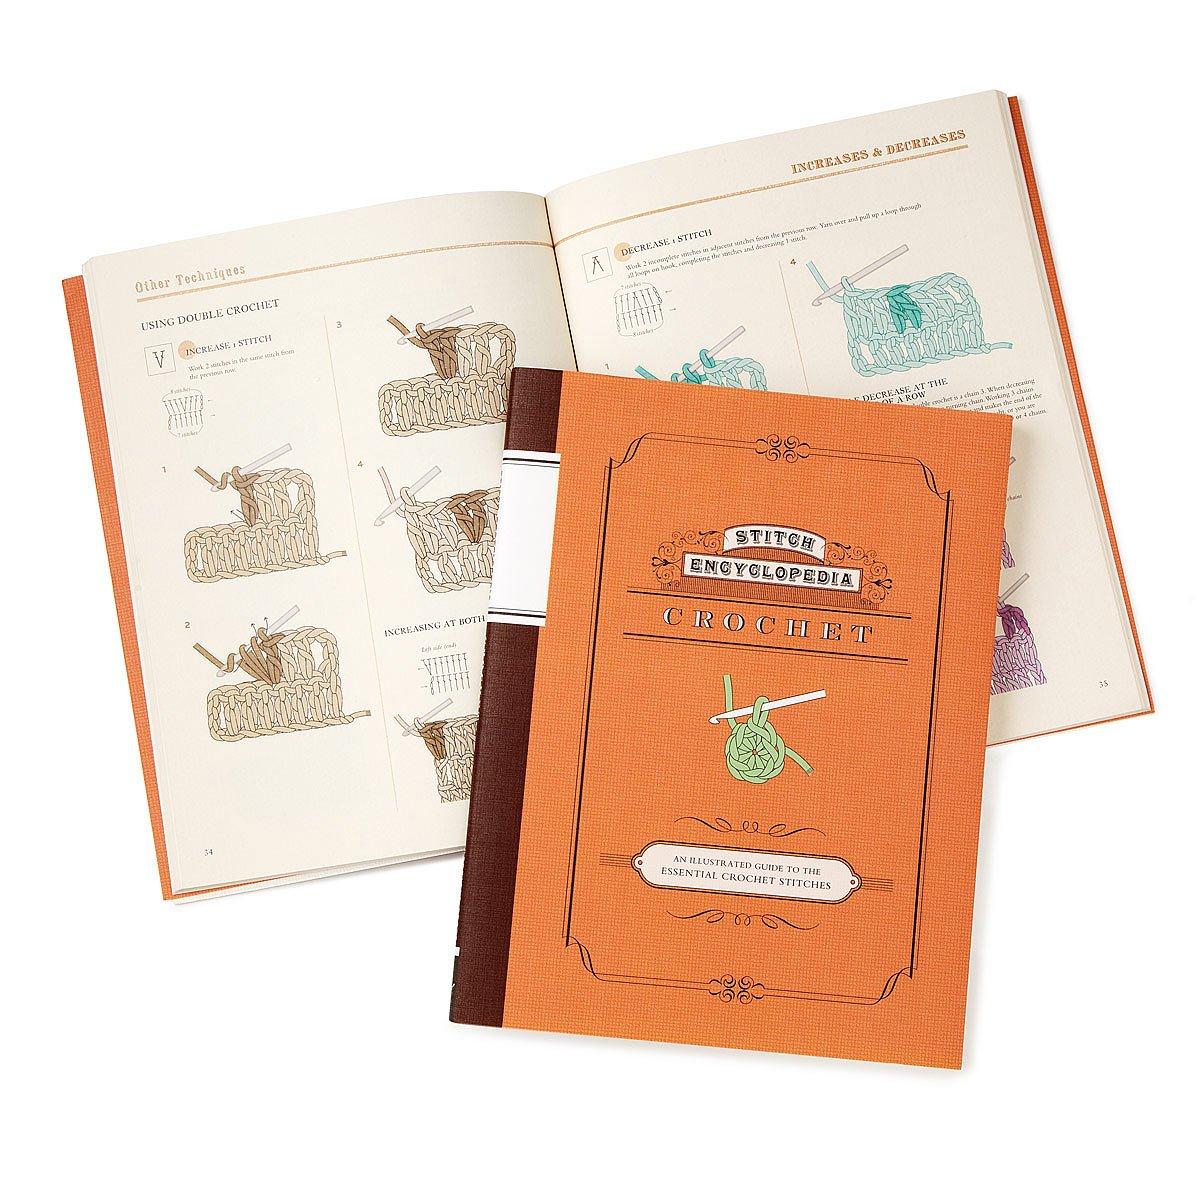 Crochet Stitches Encyclopedia : Crochet Stitch Encyclopedia crochet how to, craft guide ...